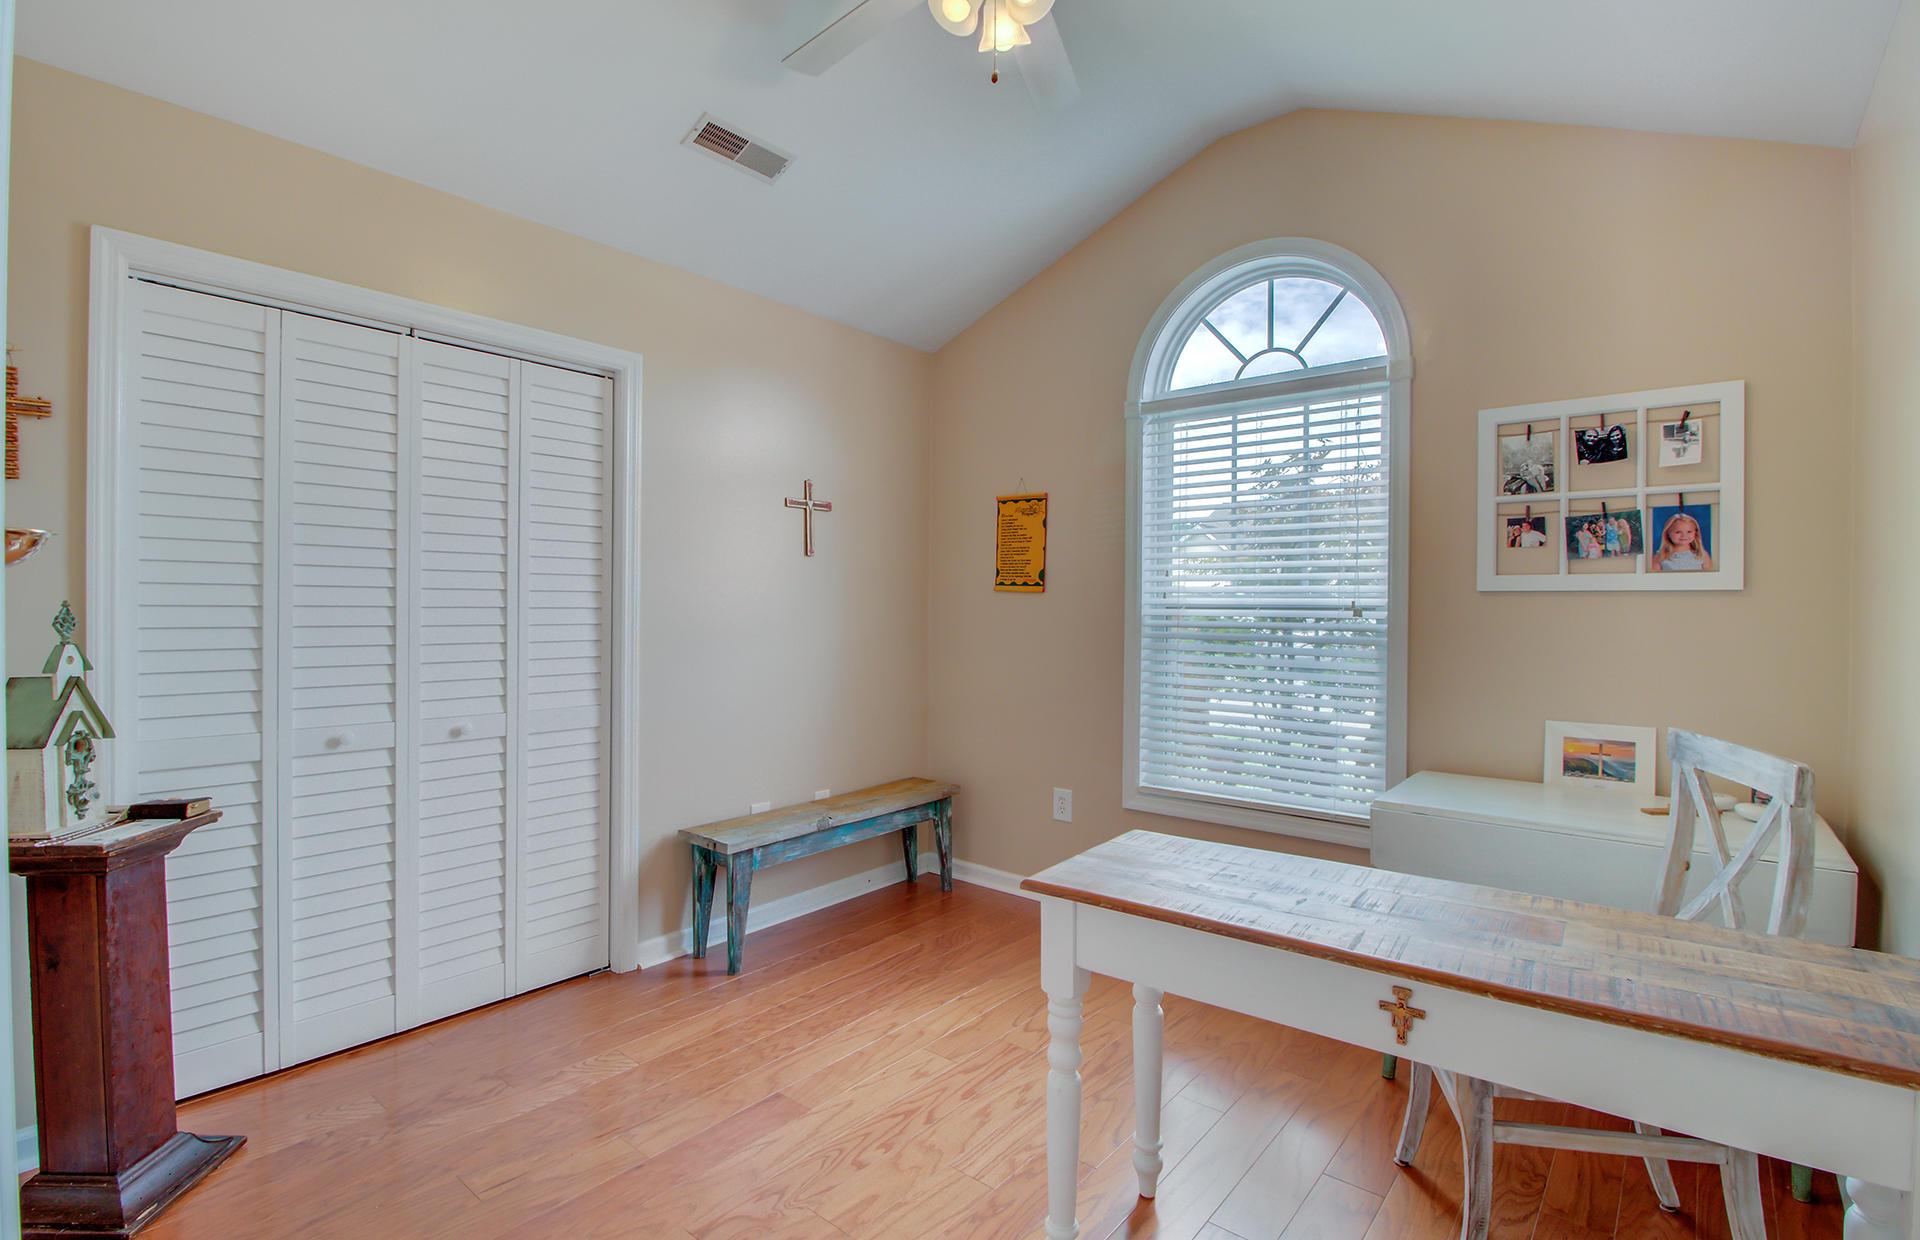 Park West Homes For Sale - 1500 Wellesley, Mount Pleasant, SC - 13